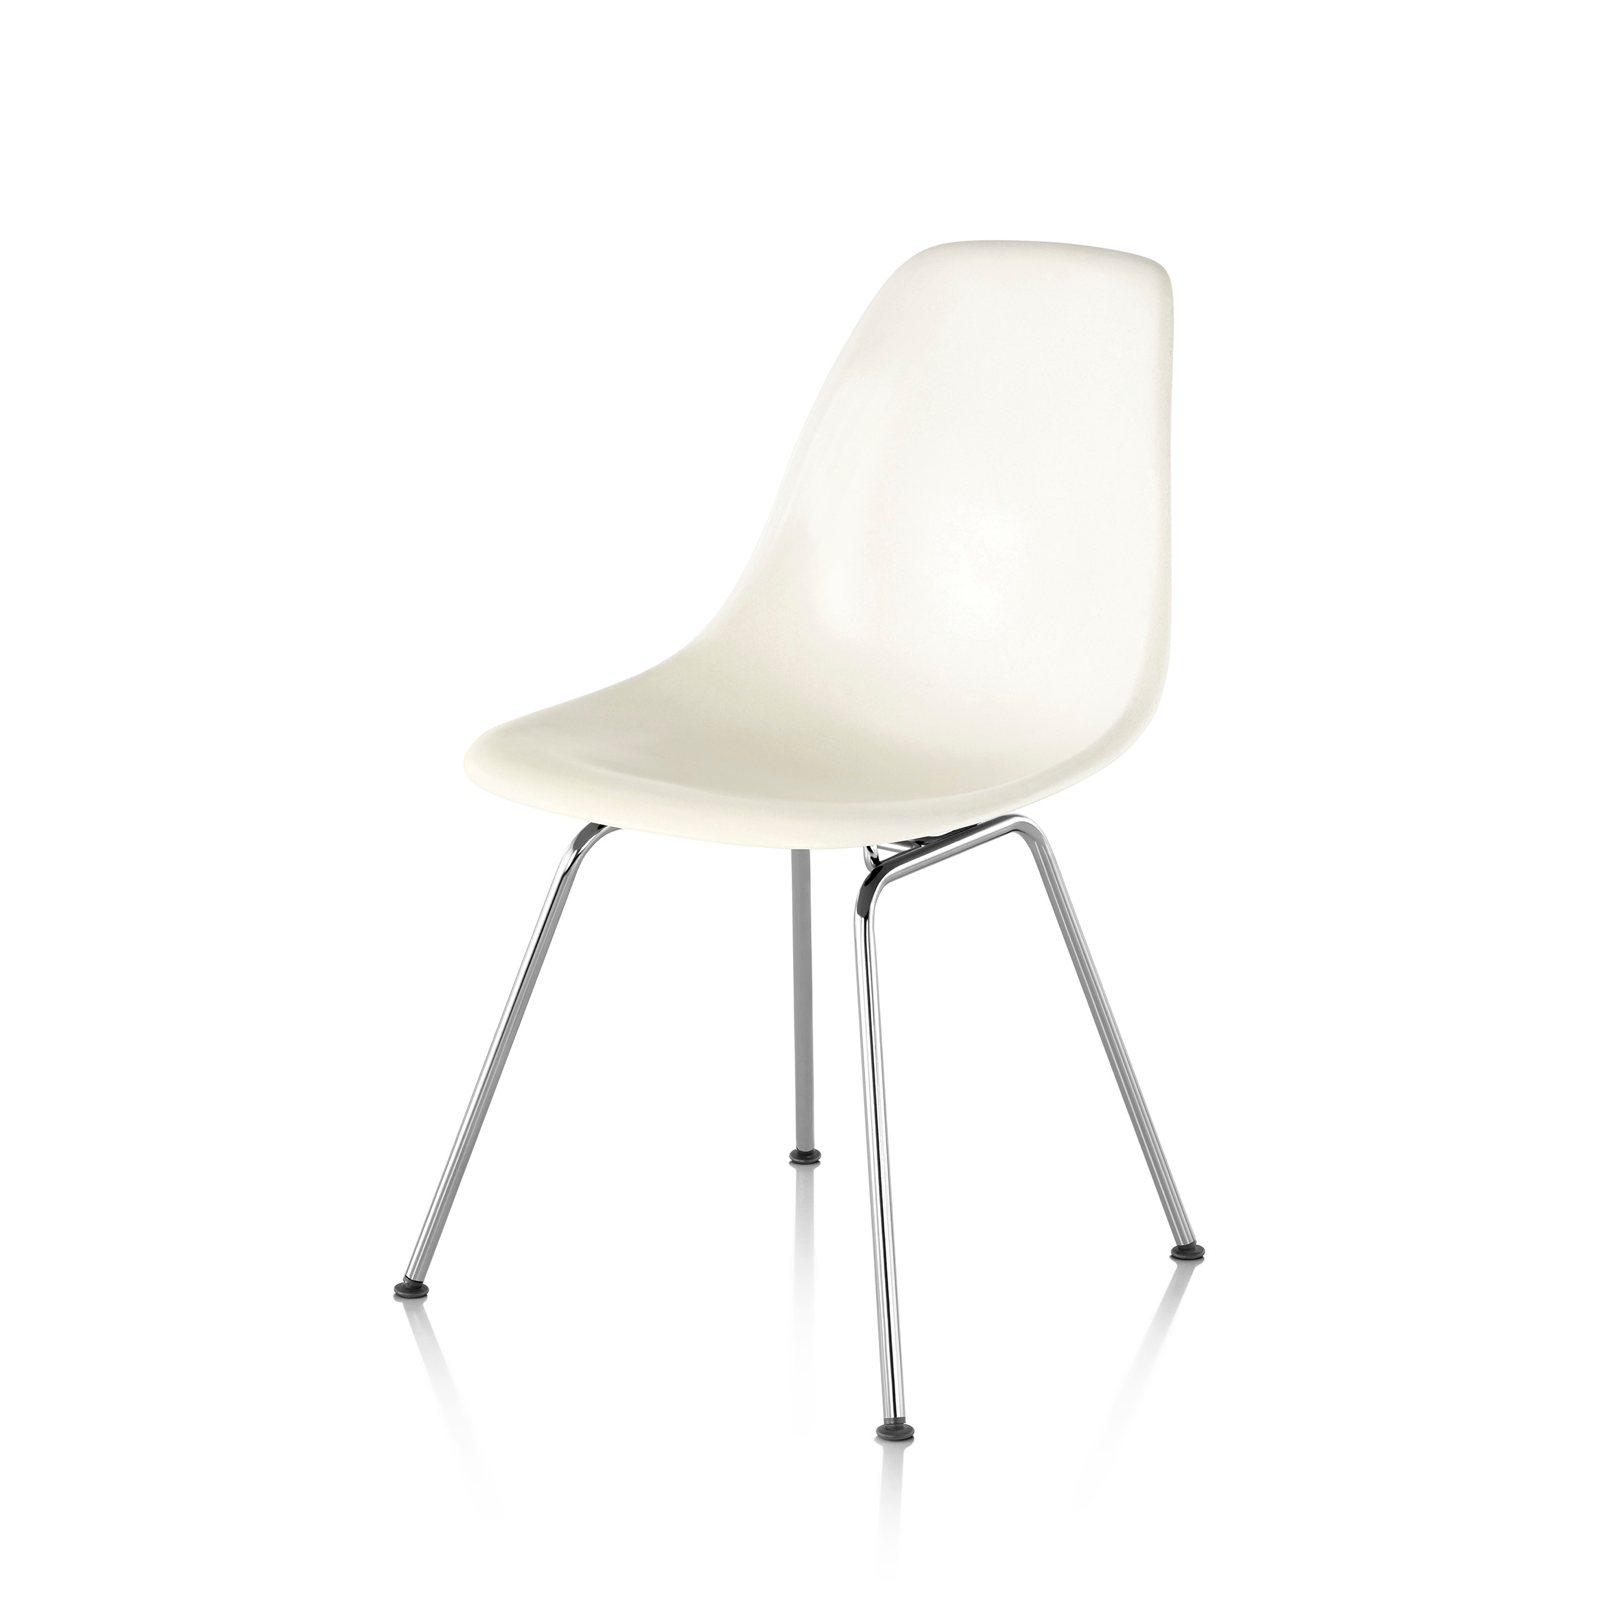 Herman Miller Eames Molded Plastic Chair herman miller eames molded plastic chair - grafill